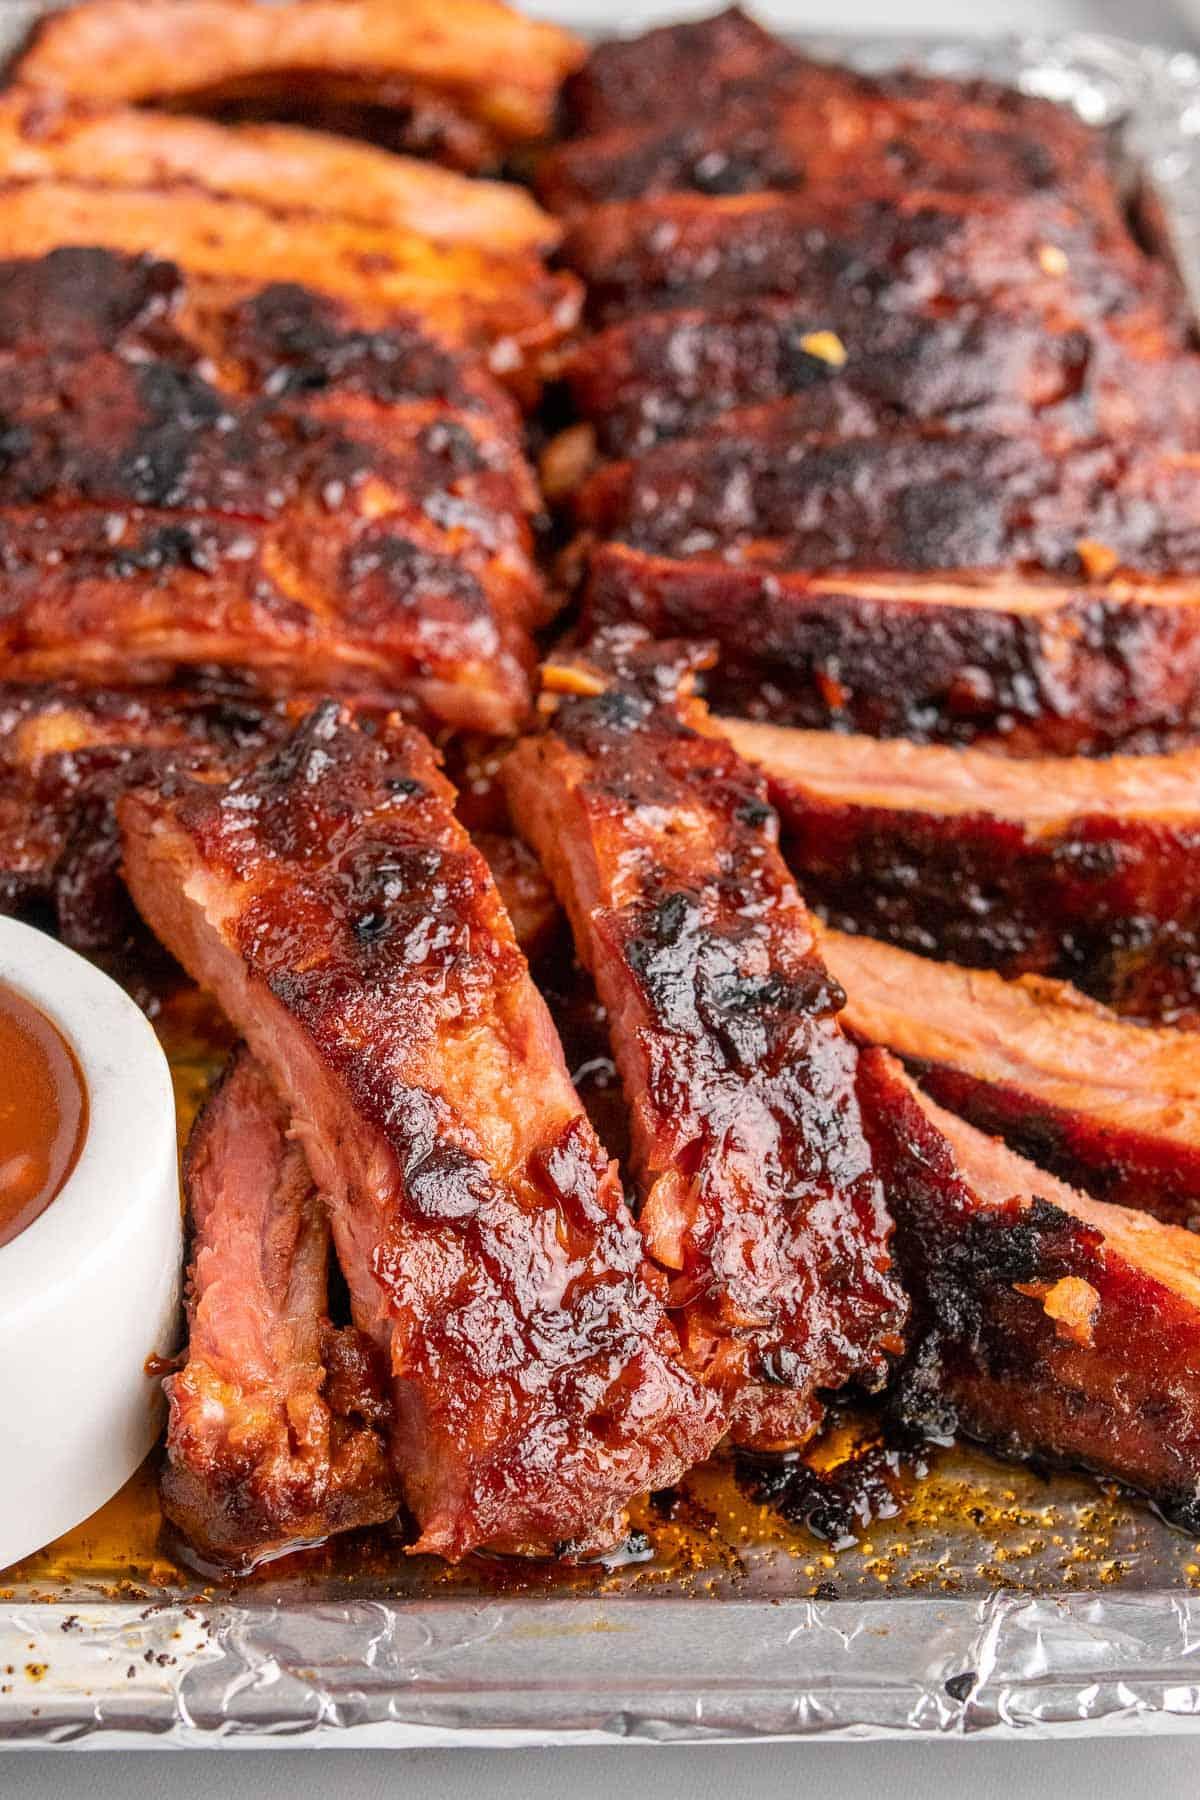 Closeup of sliced ribs on a baking sheet